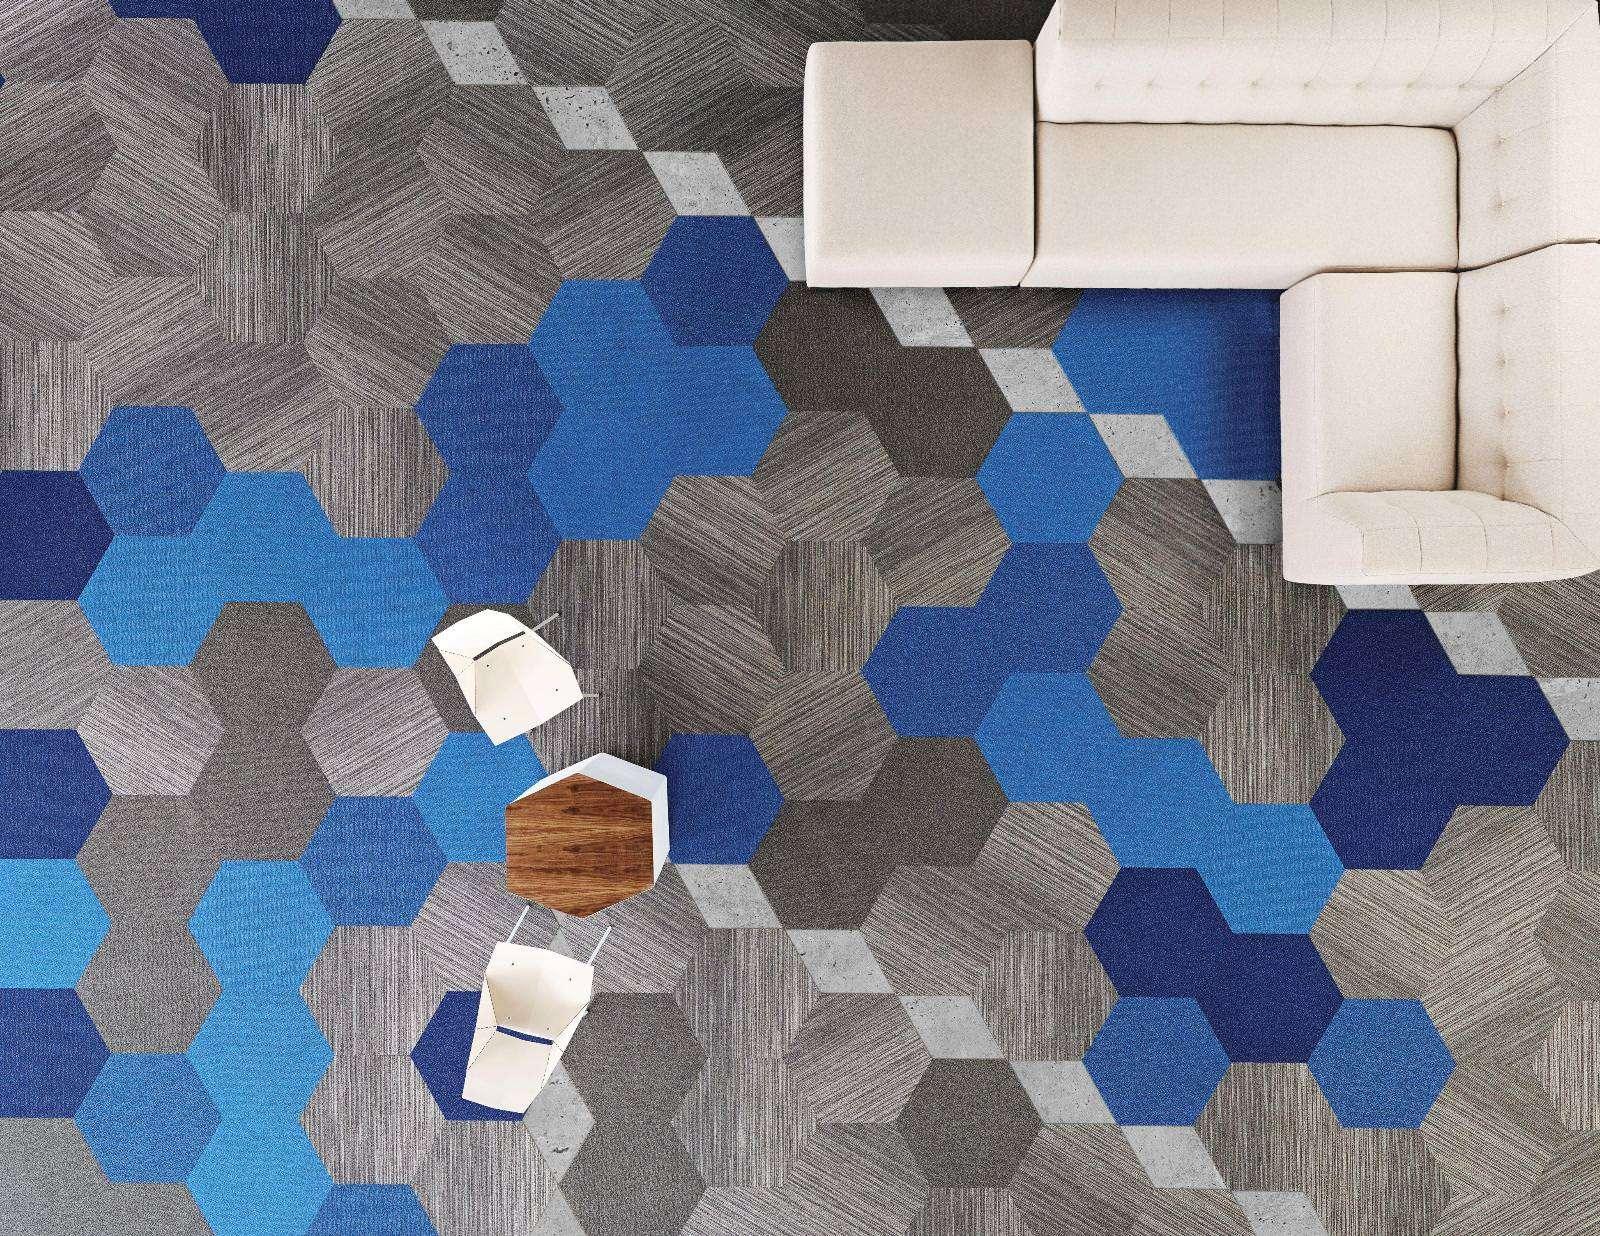 Keeping your floors sparkling green sparkleteam for Ikea floor tile